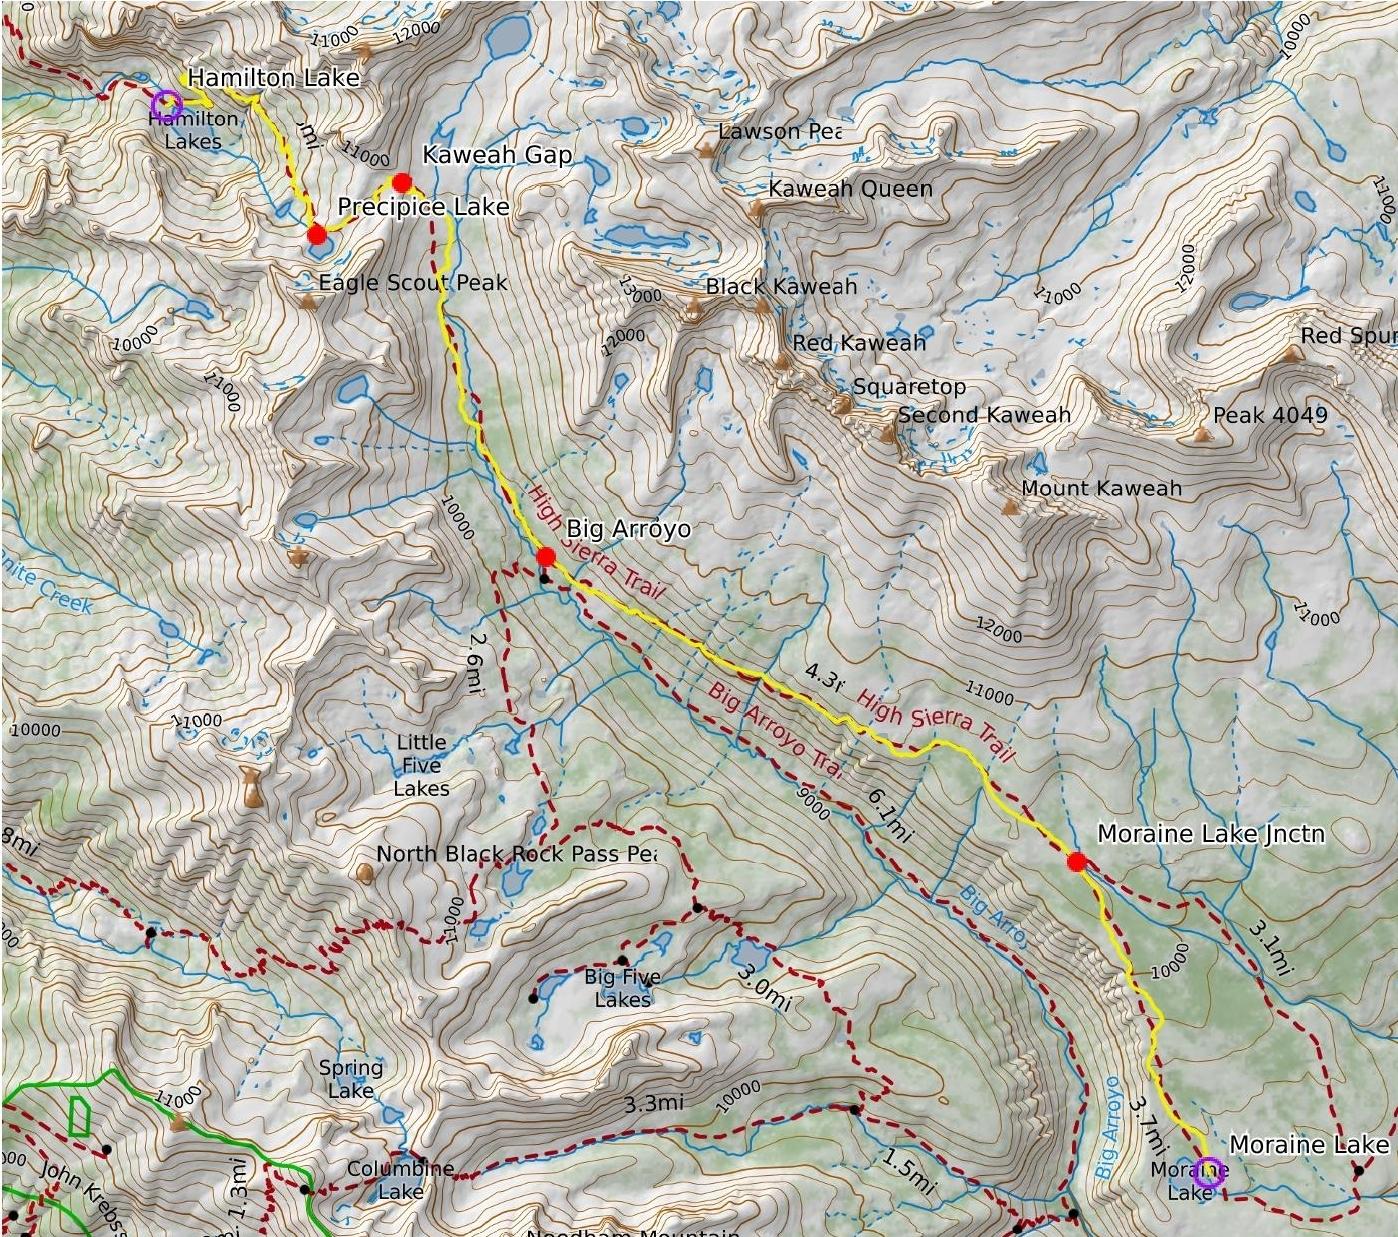 hamilton-lake-to-moraine-lake-hst-map.jpeg